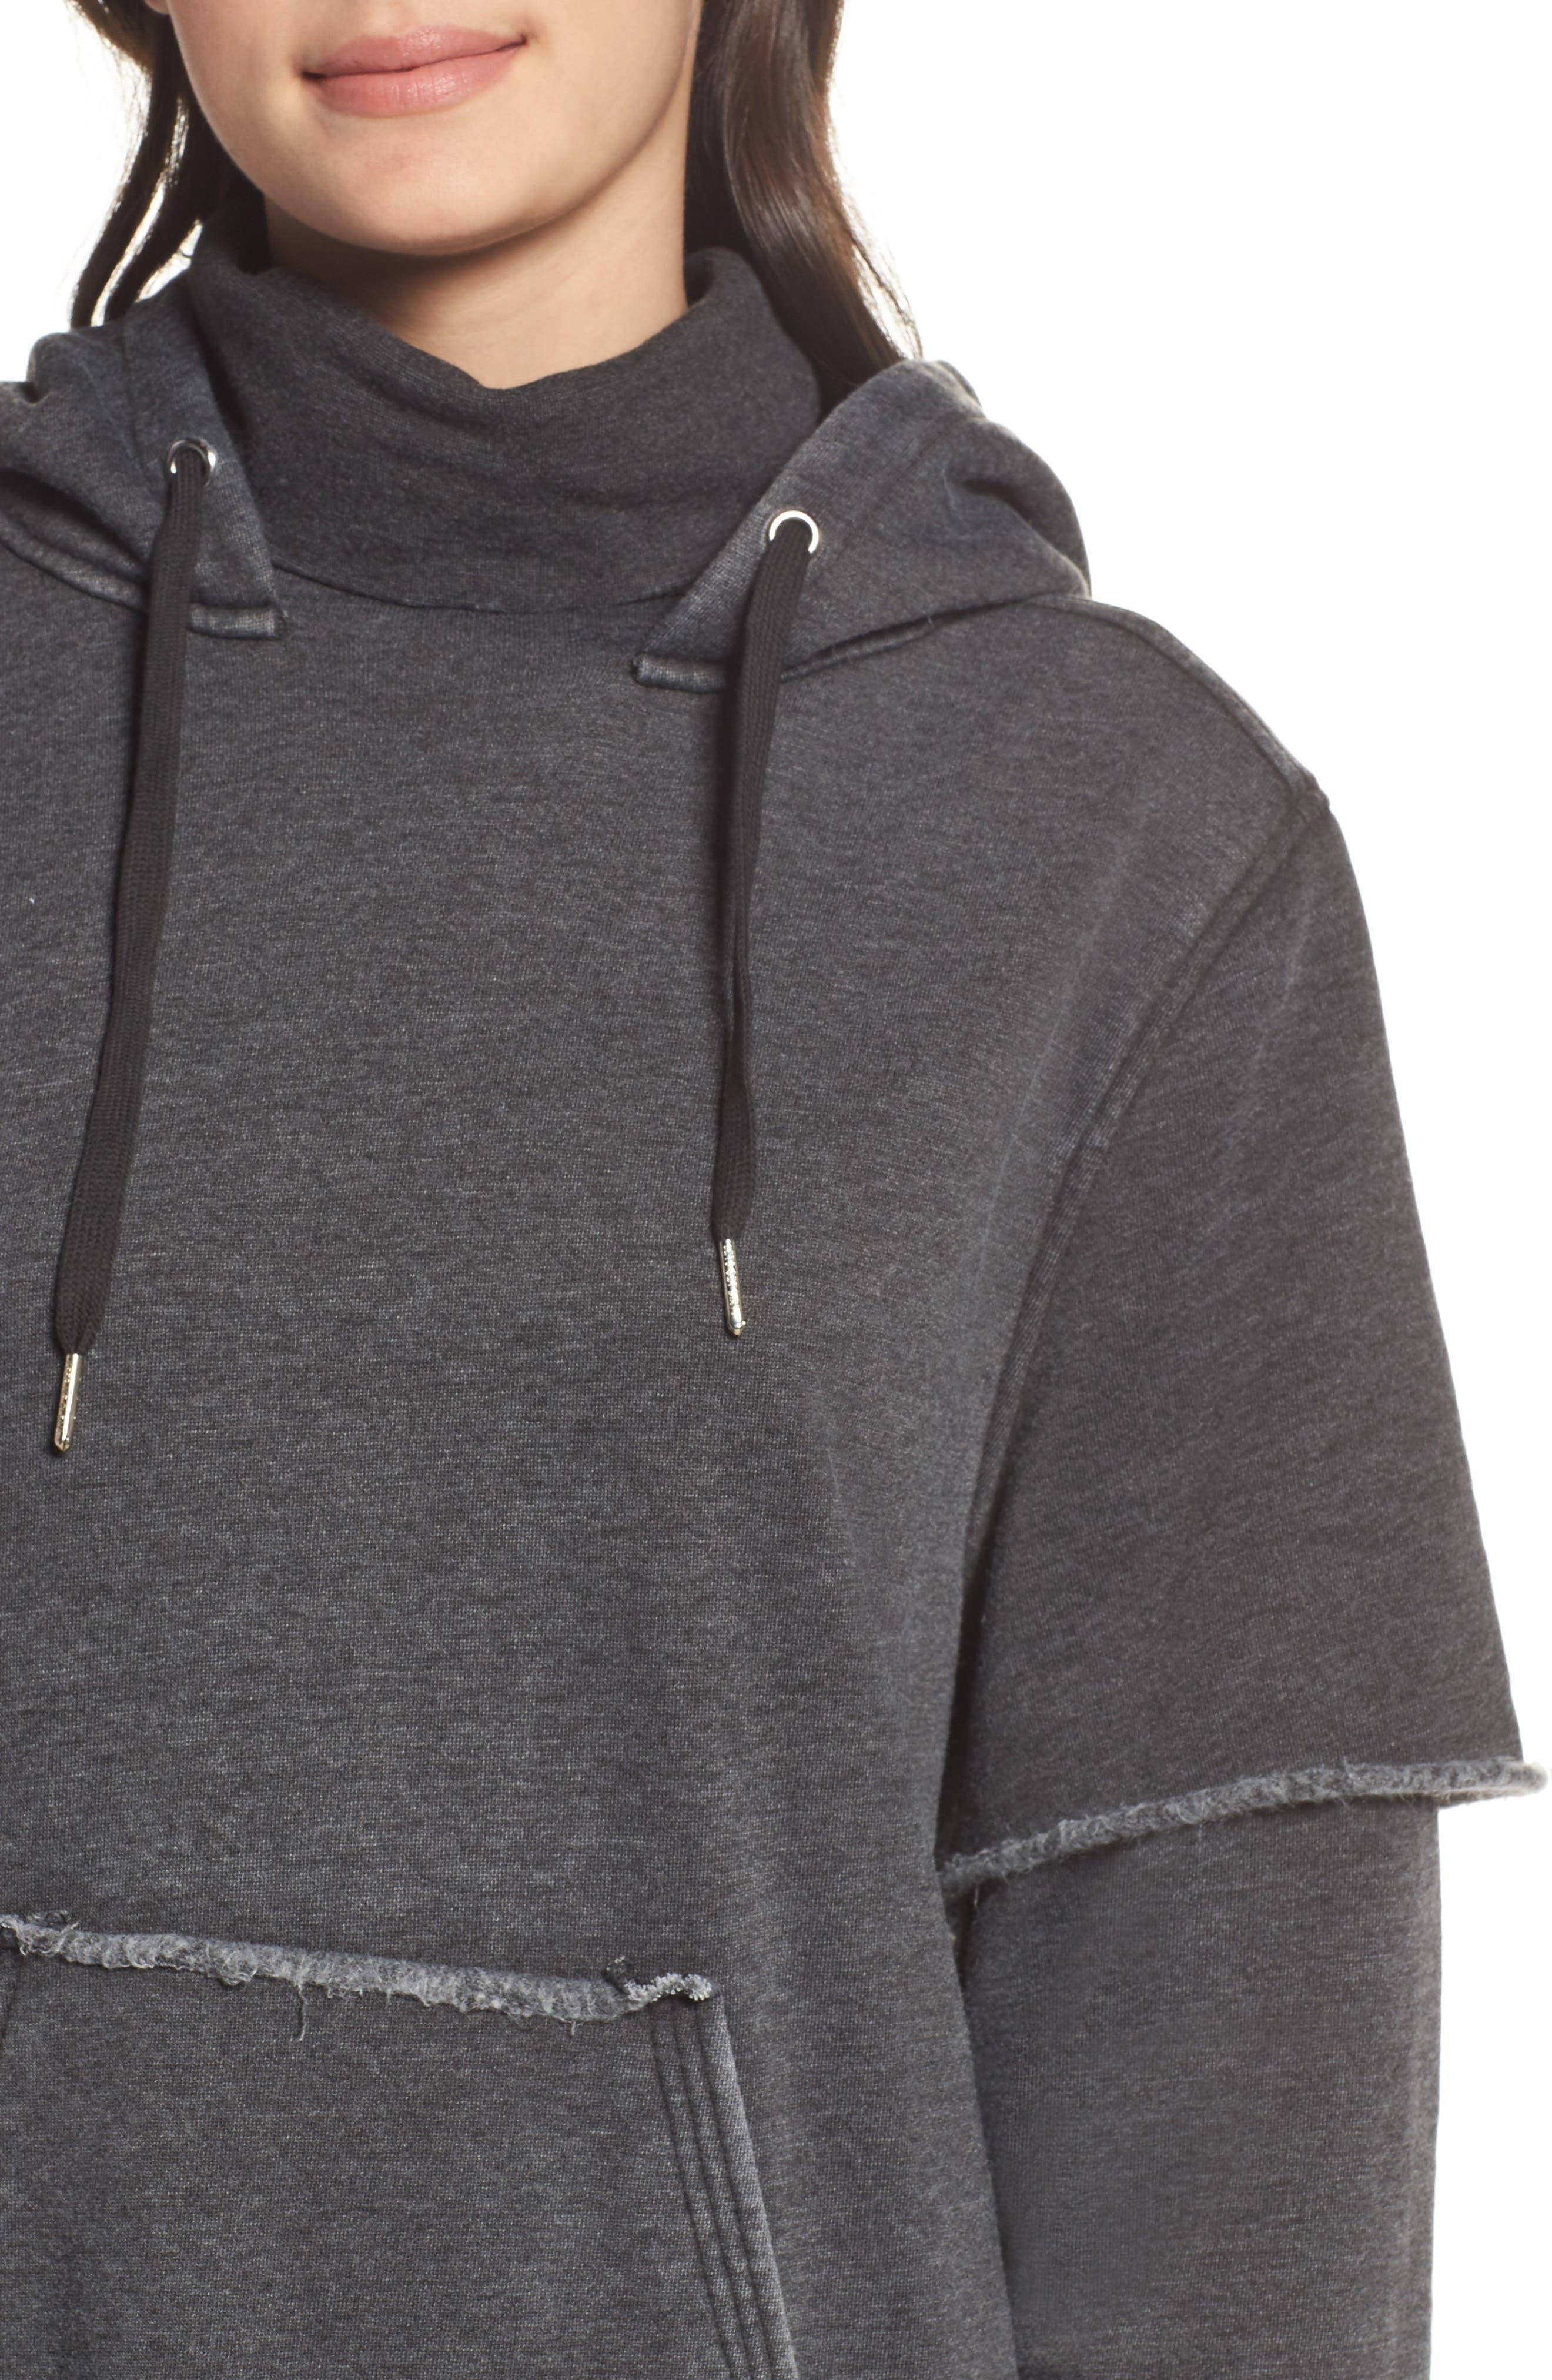 Good Hood Sweatshirt Dress,                             Alternate thumbnail 4, color,                             020